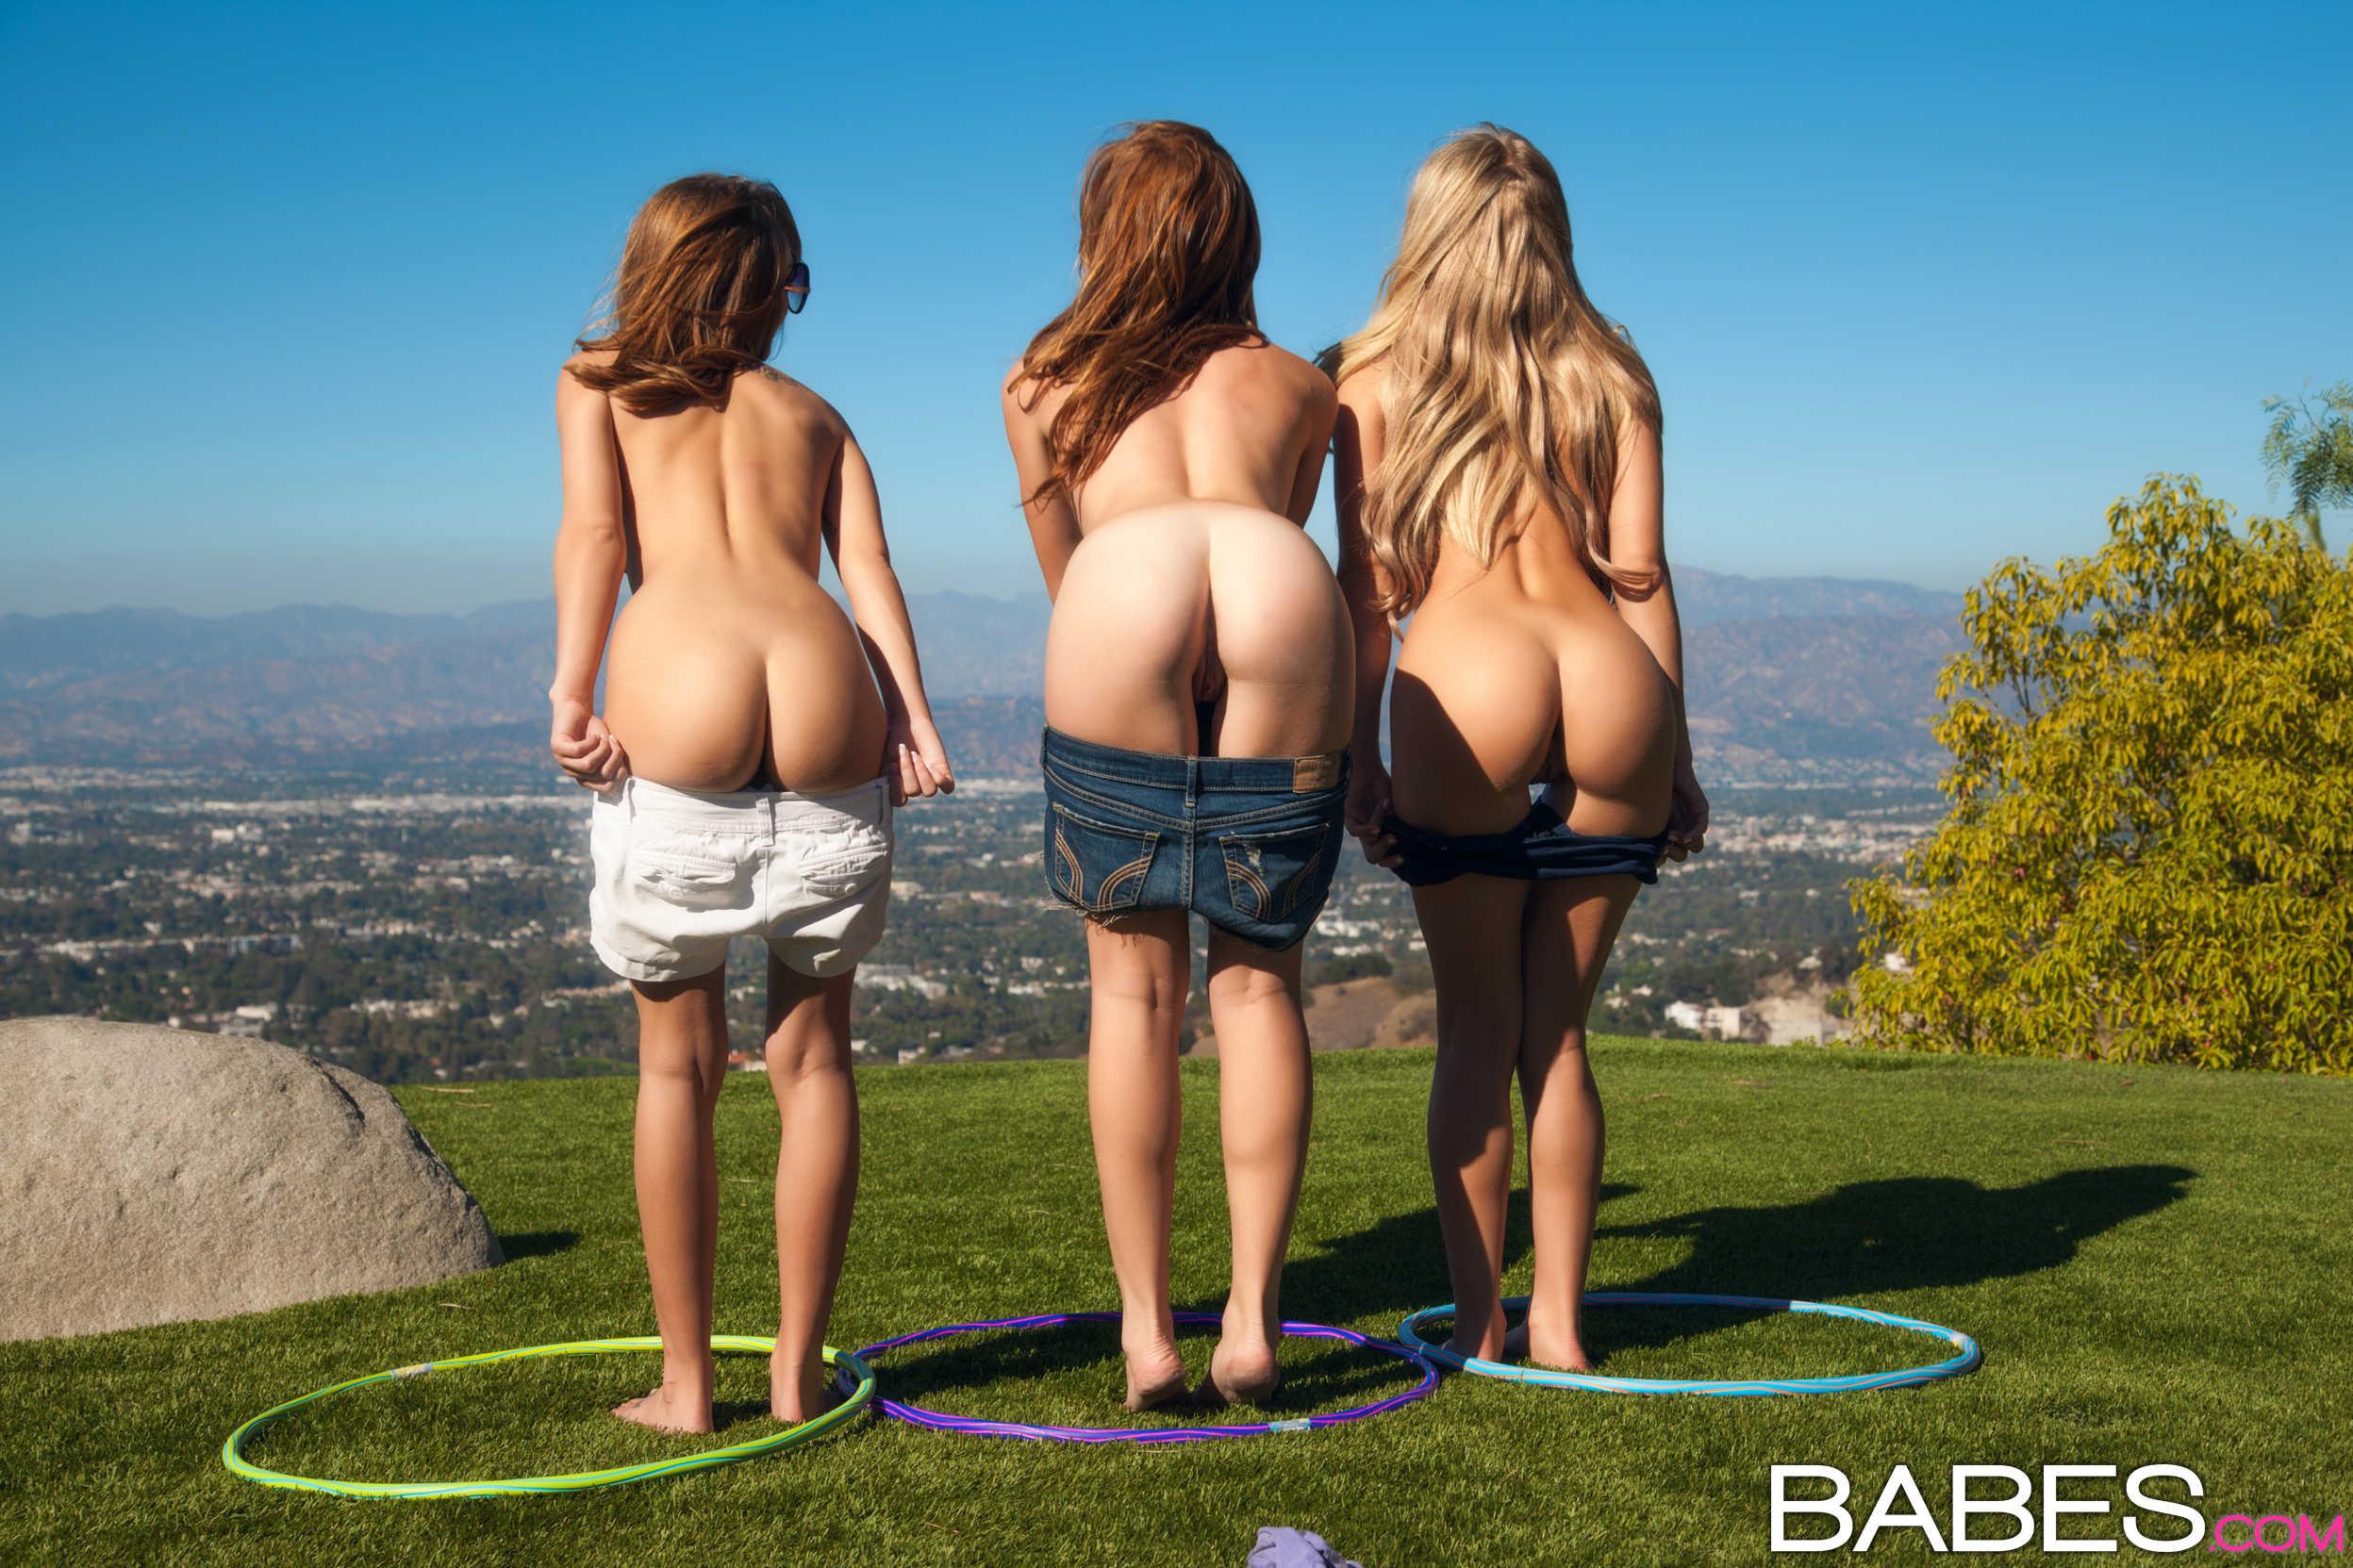 naked-trio-girls-photo-mix-lesbians-vol3-99